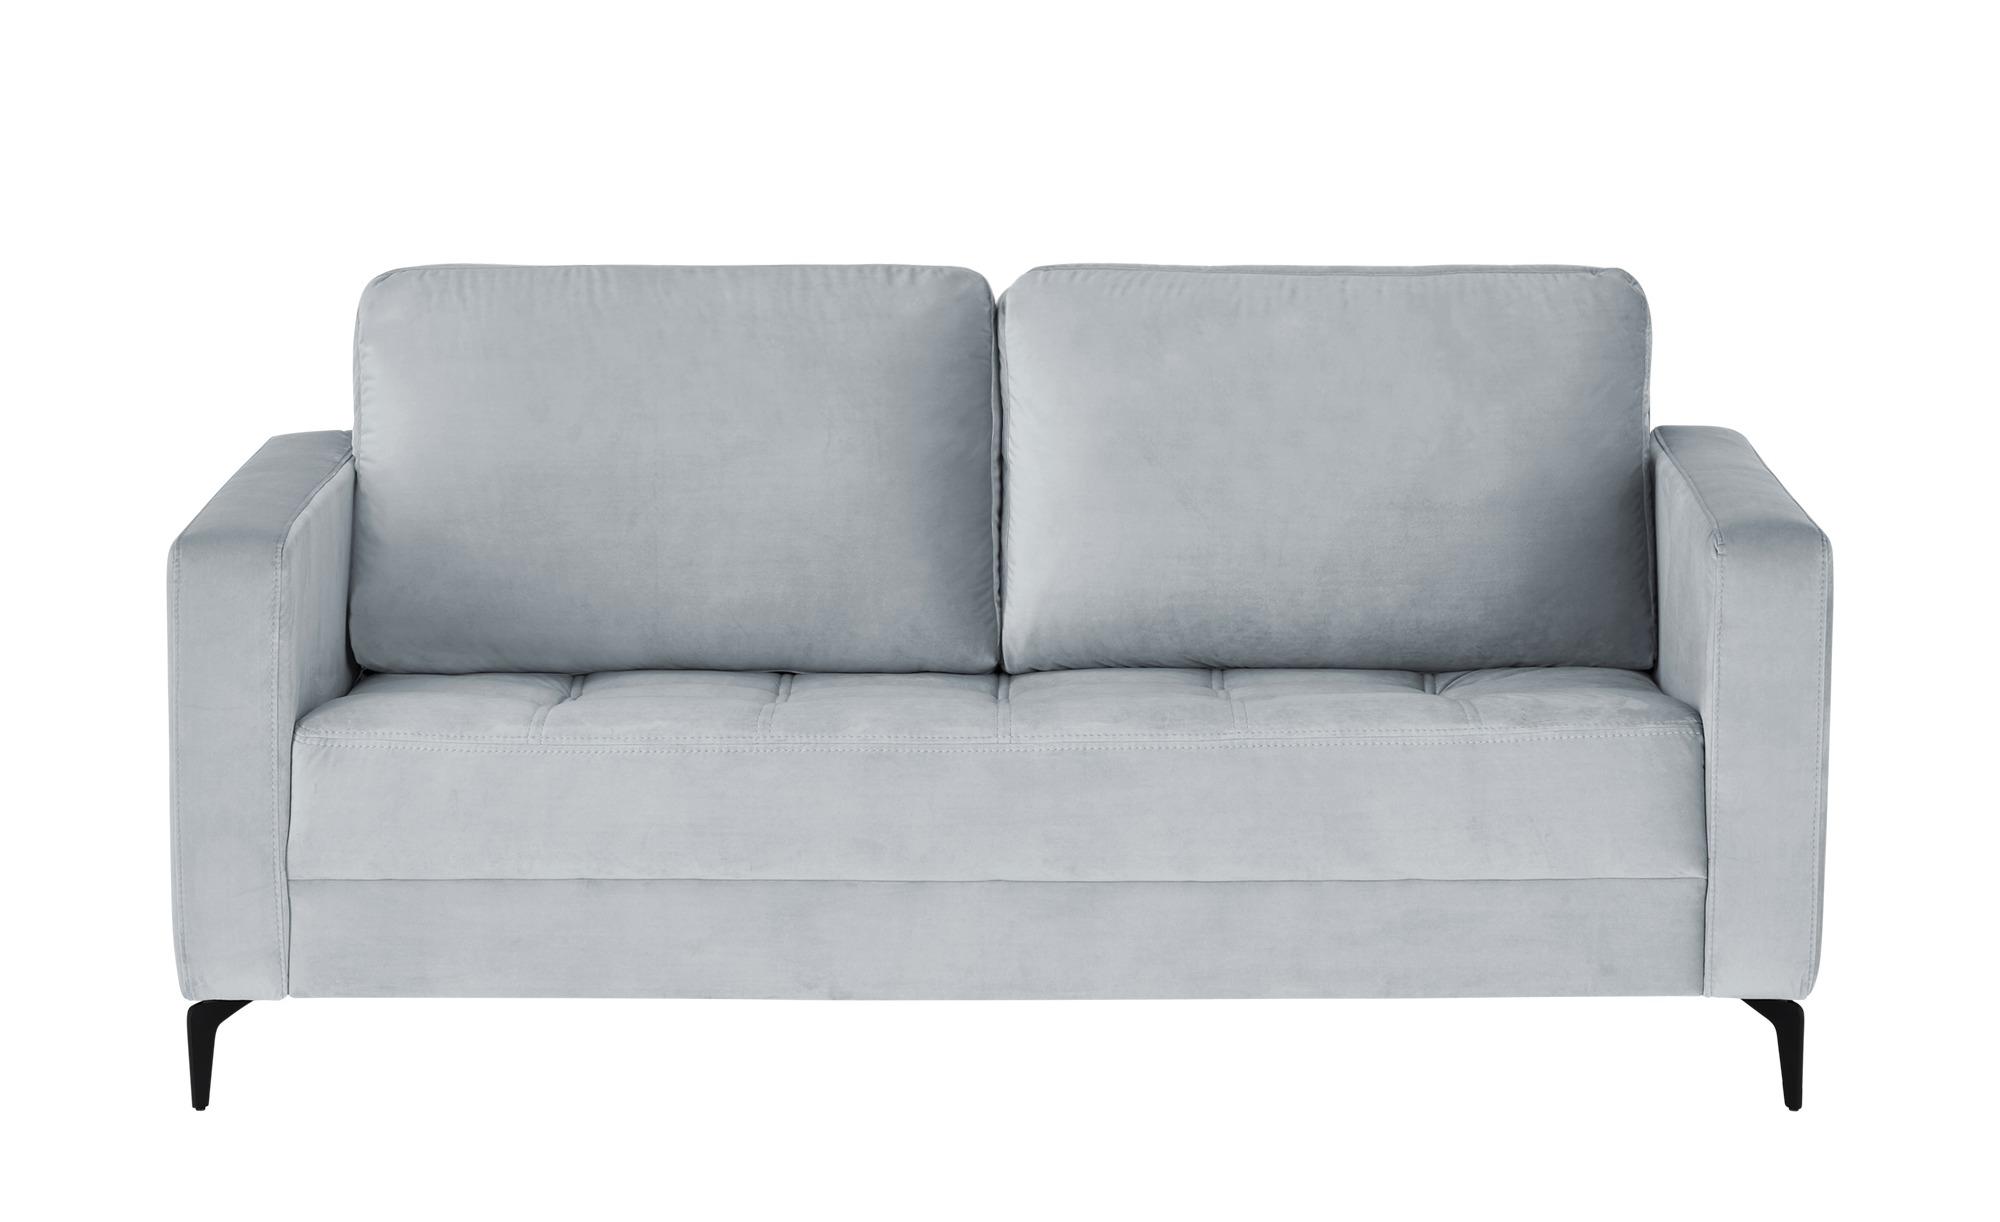 smart Sofa  Gesa ¦ blau ¦ Maße (cm): B: 178 H: 83 T: 91 Polstermöbel > Sofas > 2-Sitzer - Höffner